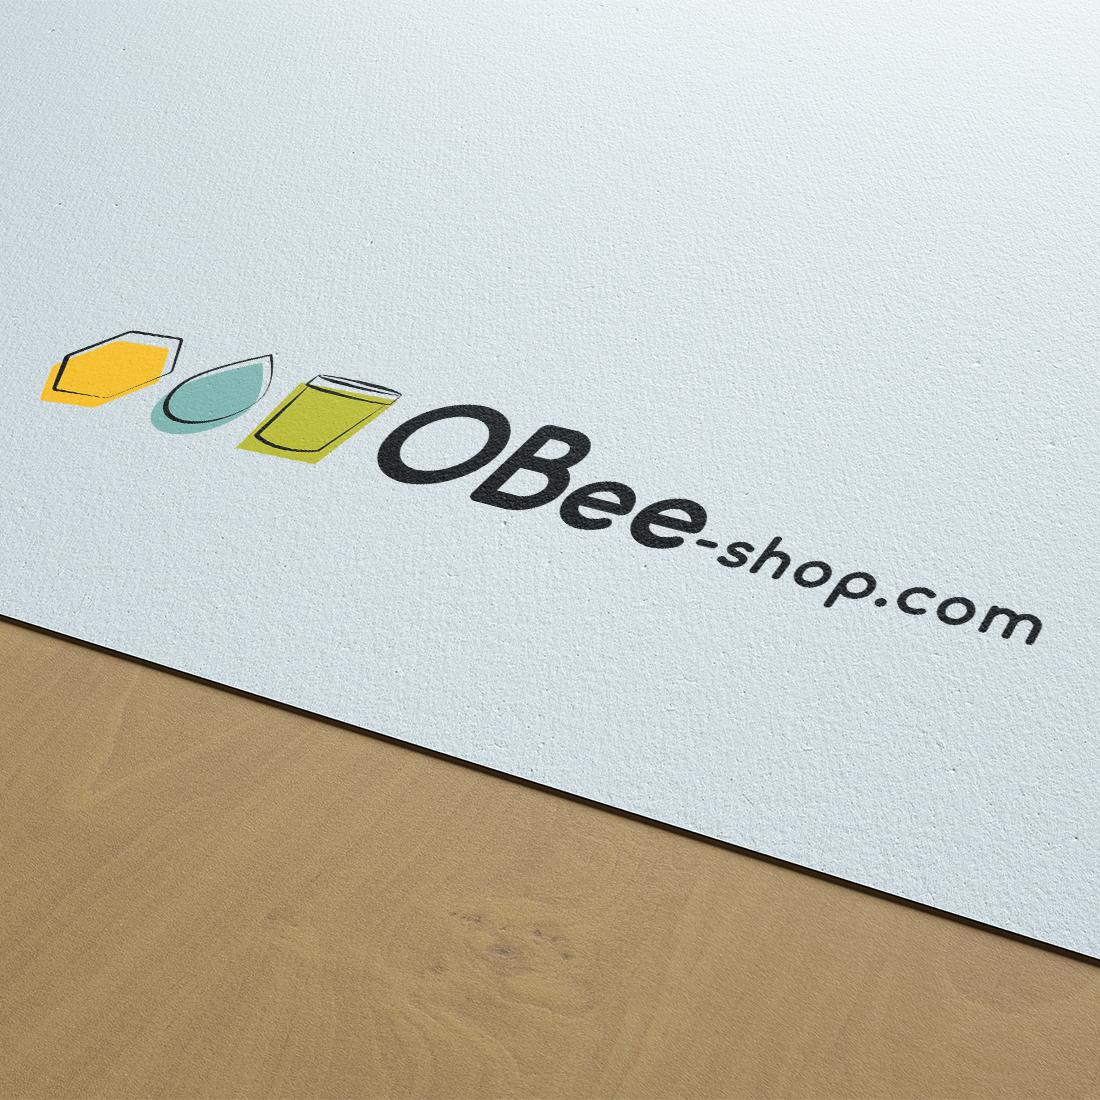 Obee_logo_03